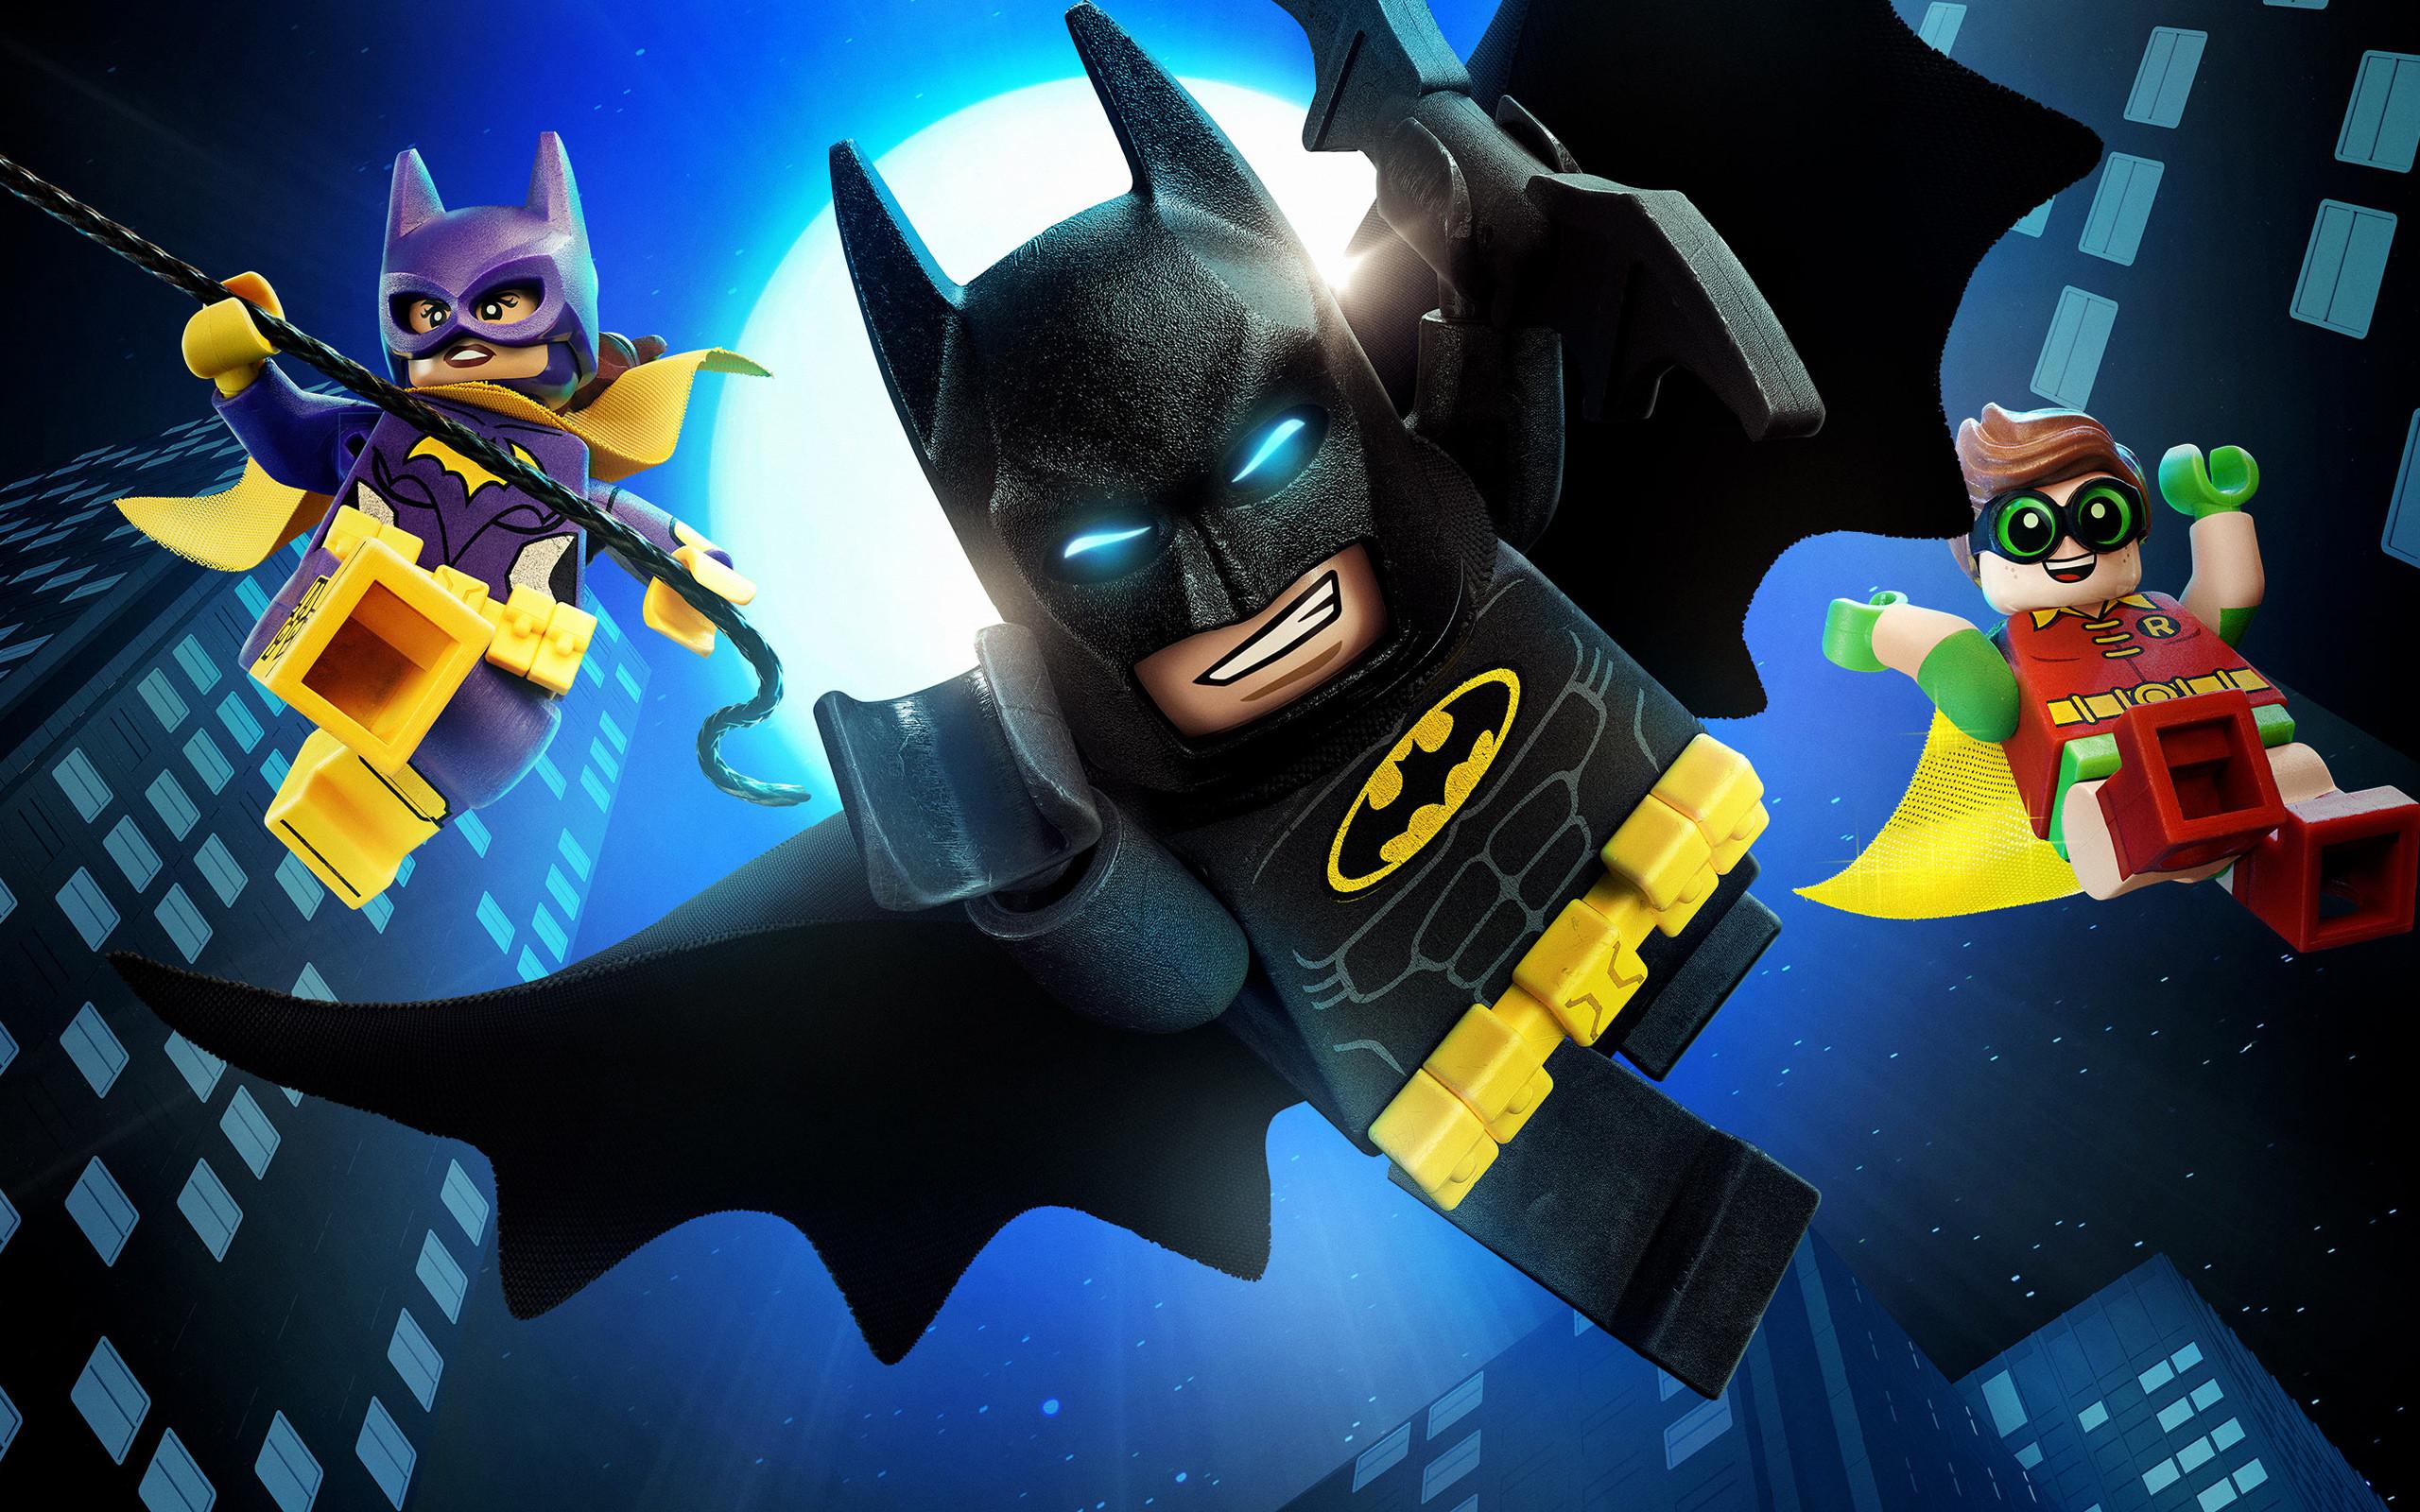 HD The LEGO Batman Movie wallpaper | The LEGO Batman Movie wallpapers hd |  Pinterest | Movie wallpapers, Lego batman movie and Lego batman